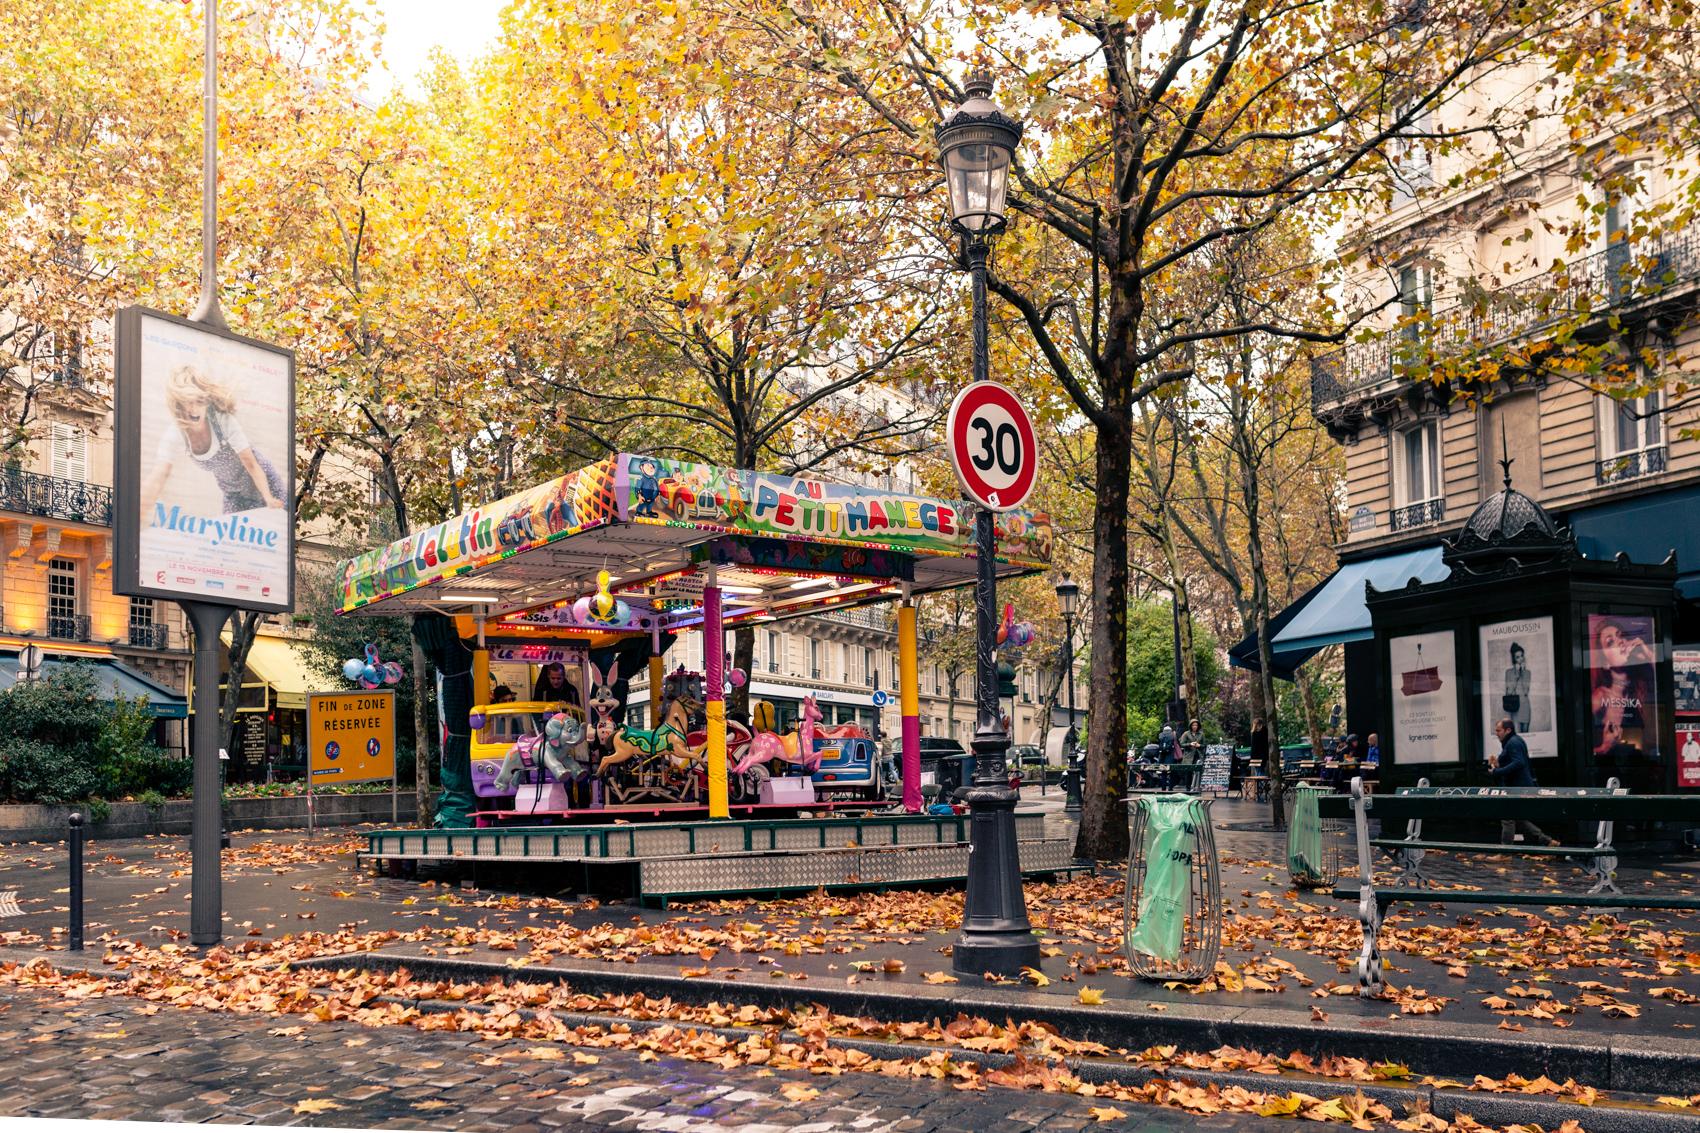 Paris_112017-39.jpg